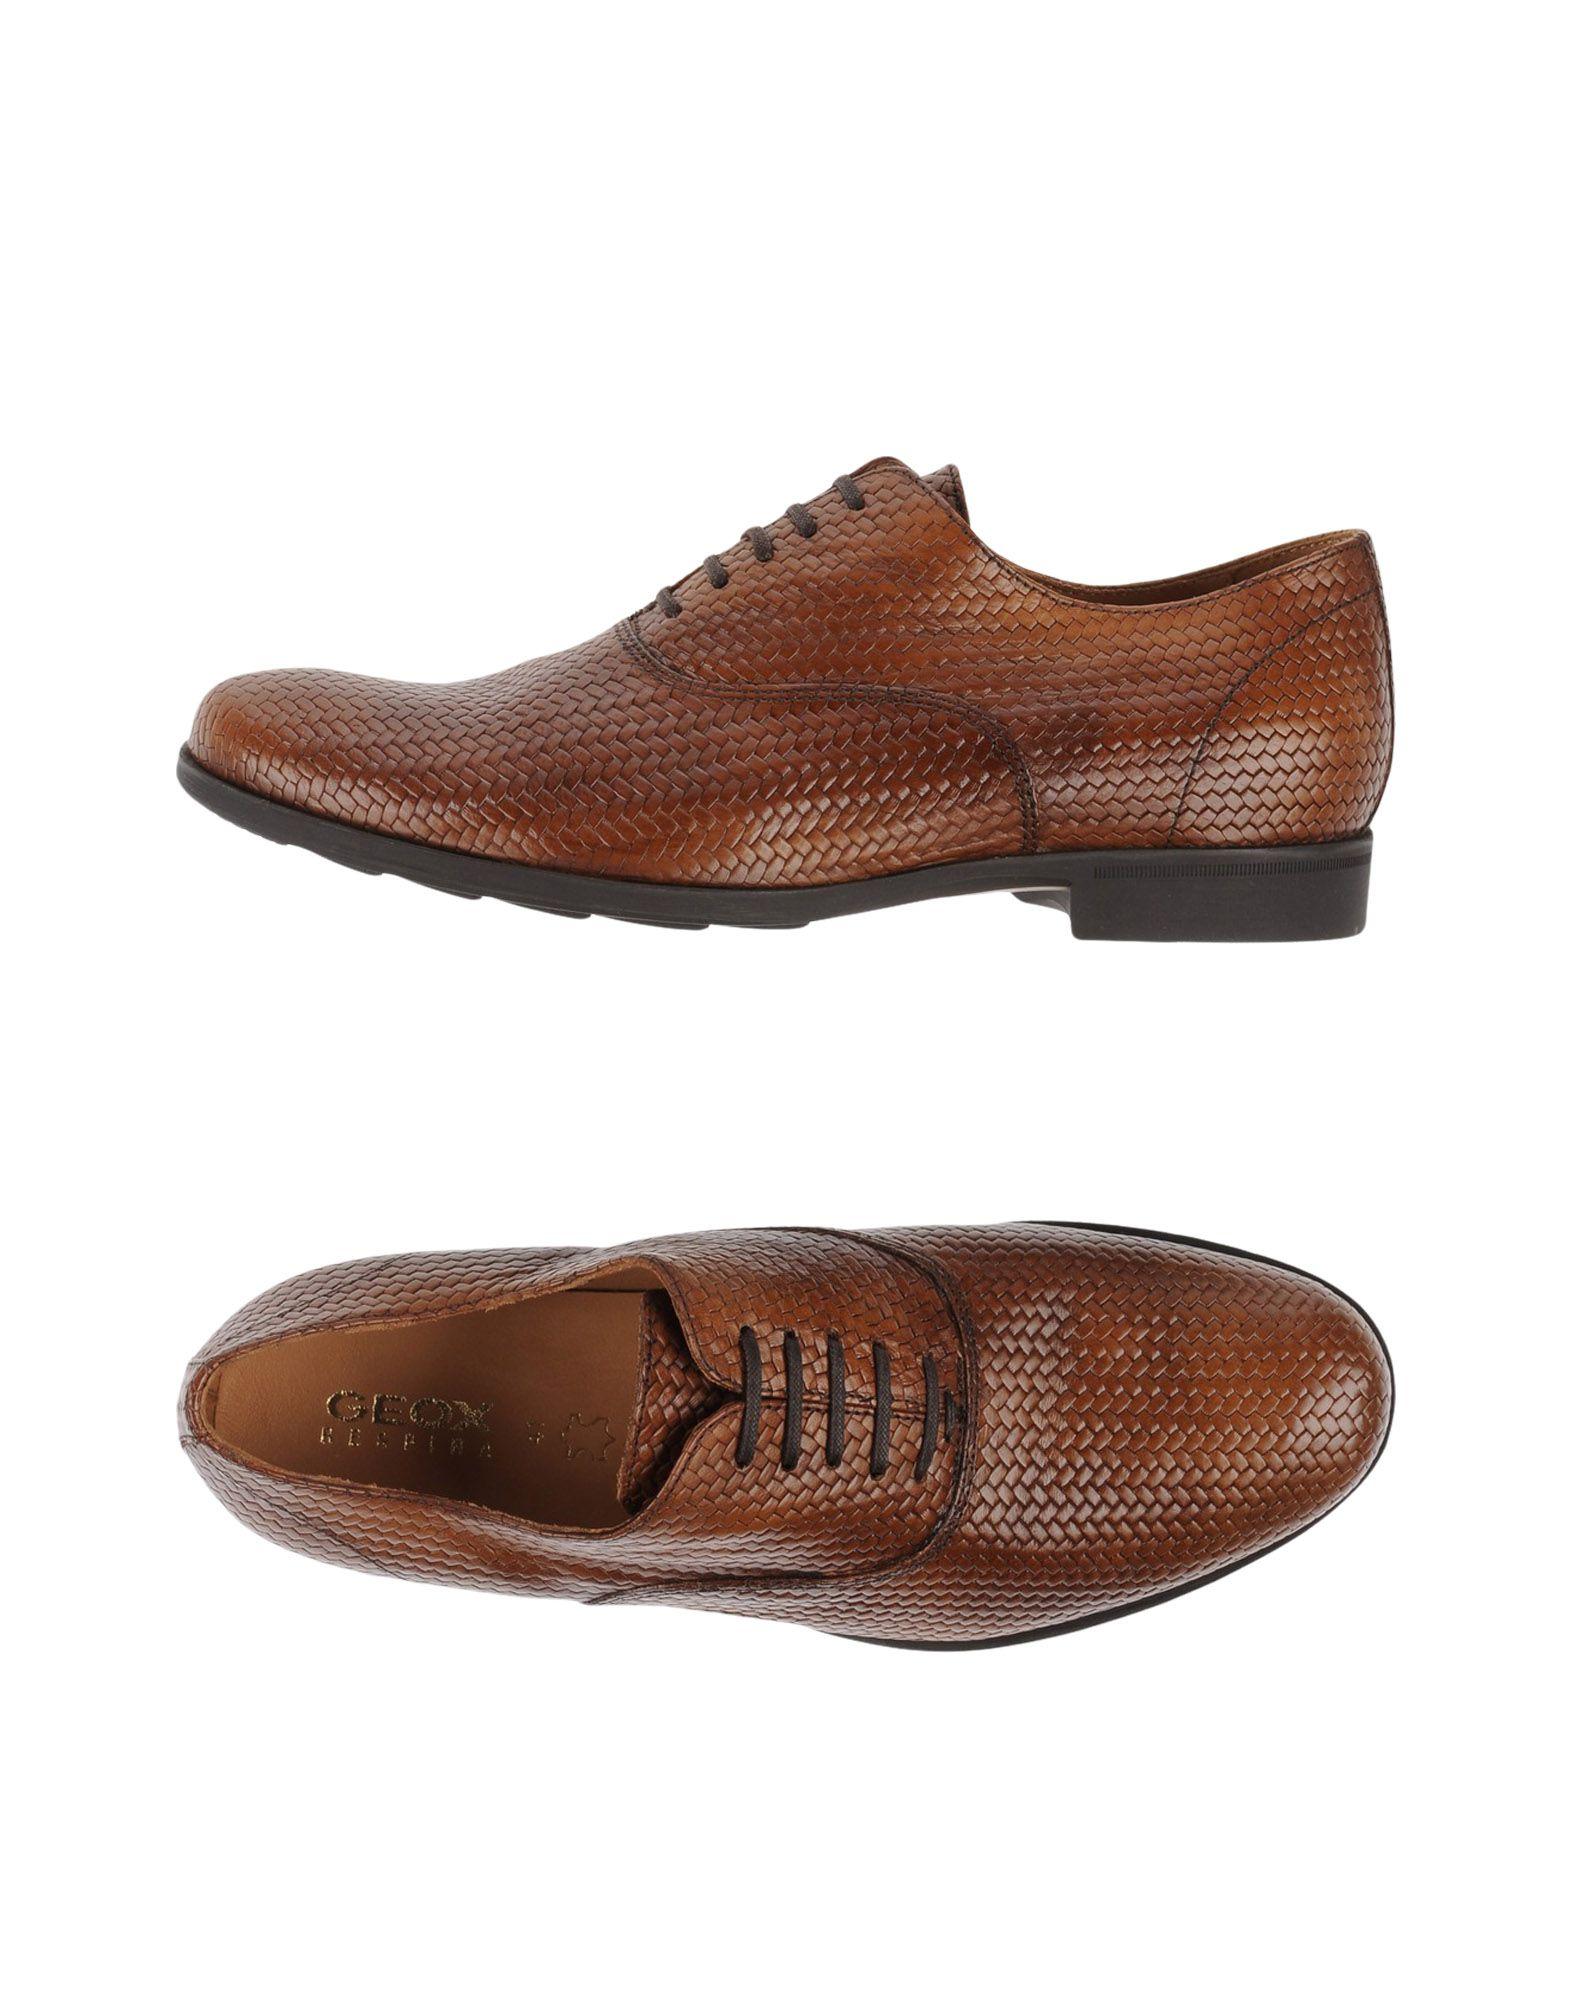 Rabatt echte Schuhe Geox Schnürschuhe Herren  11192303GX